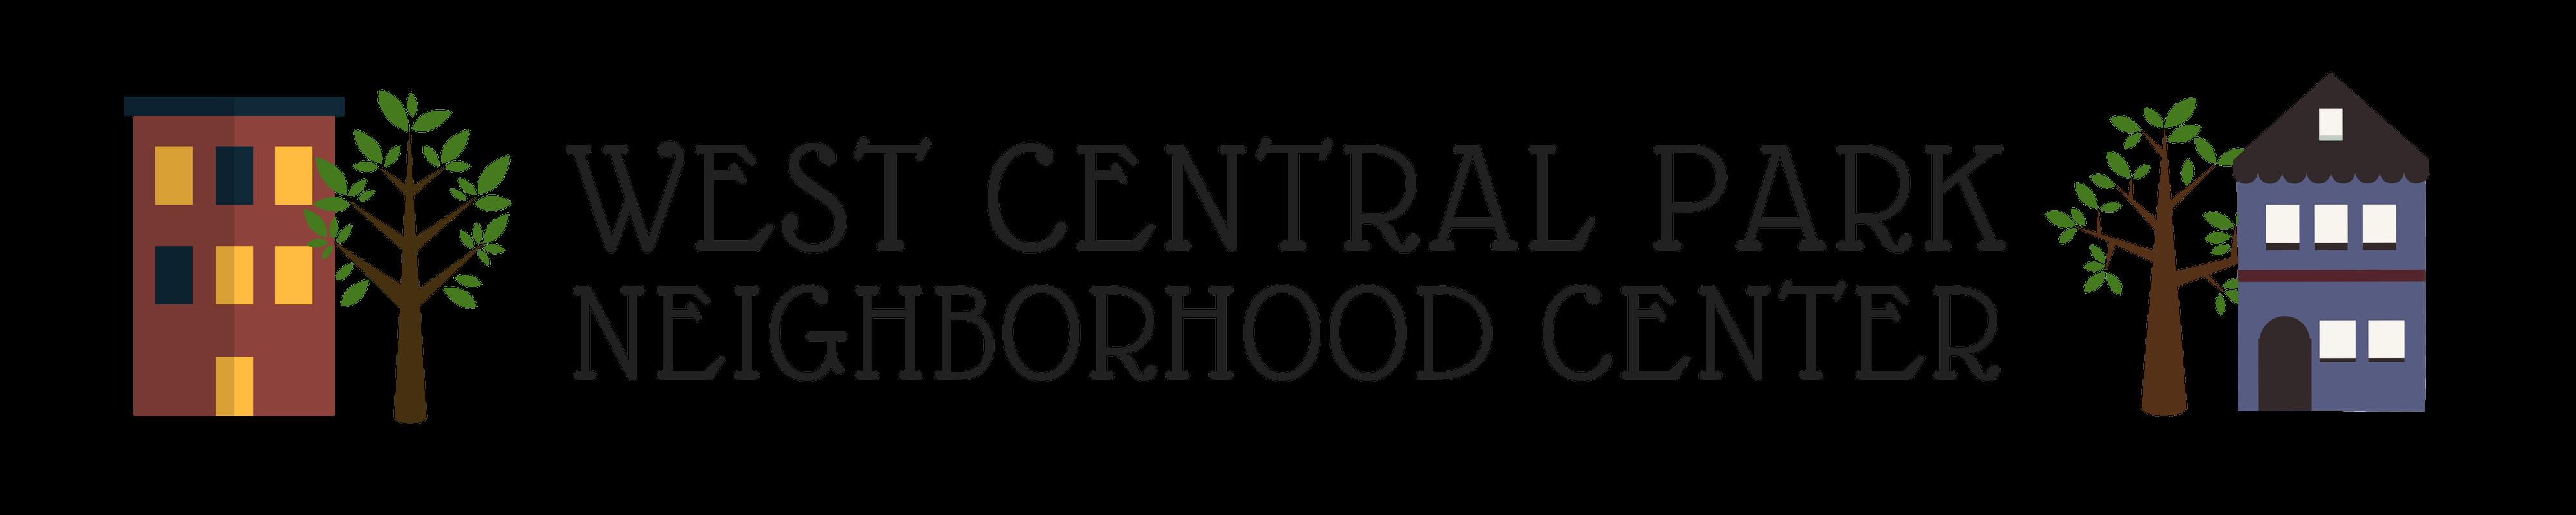 West Central Park Neighborhood Center